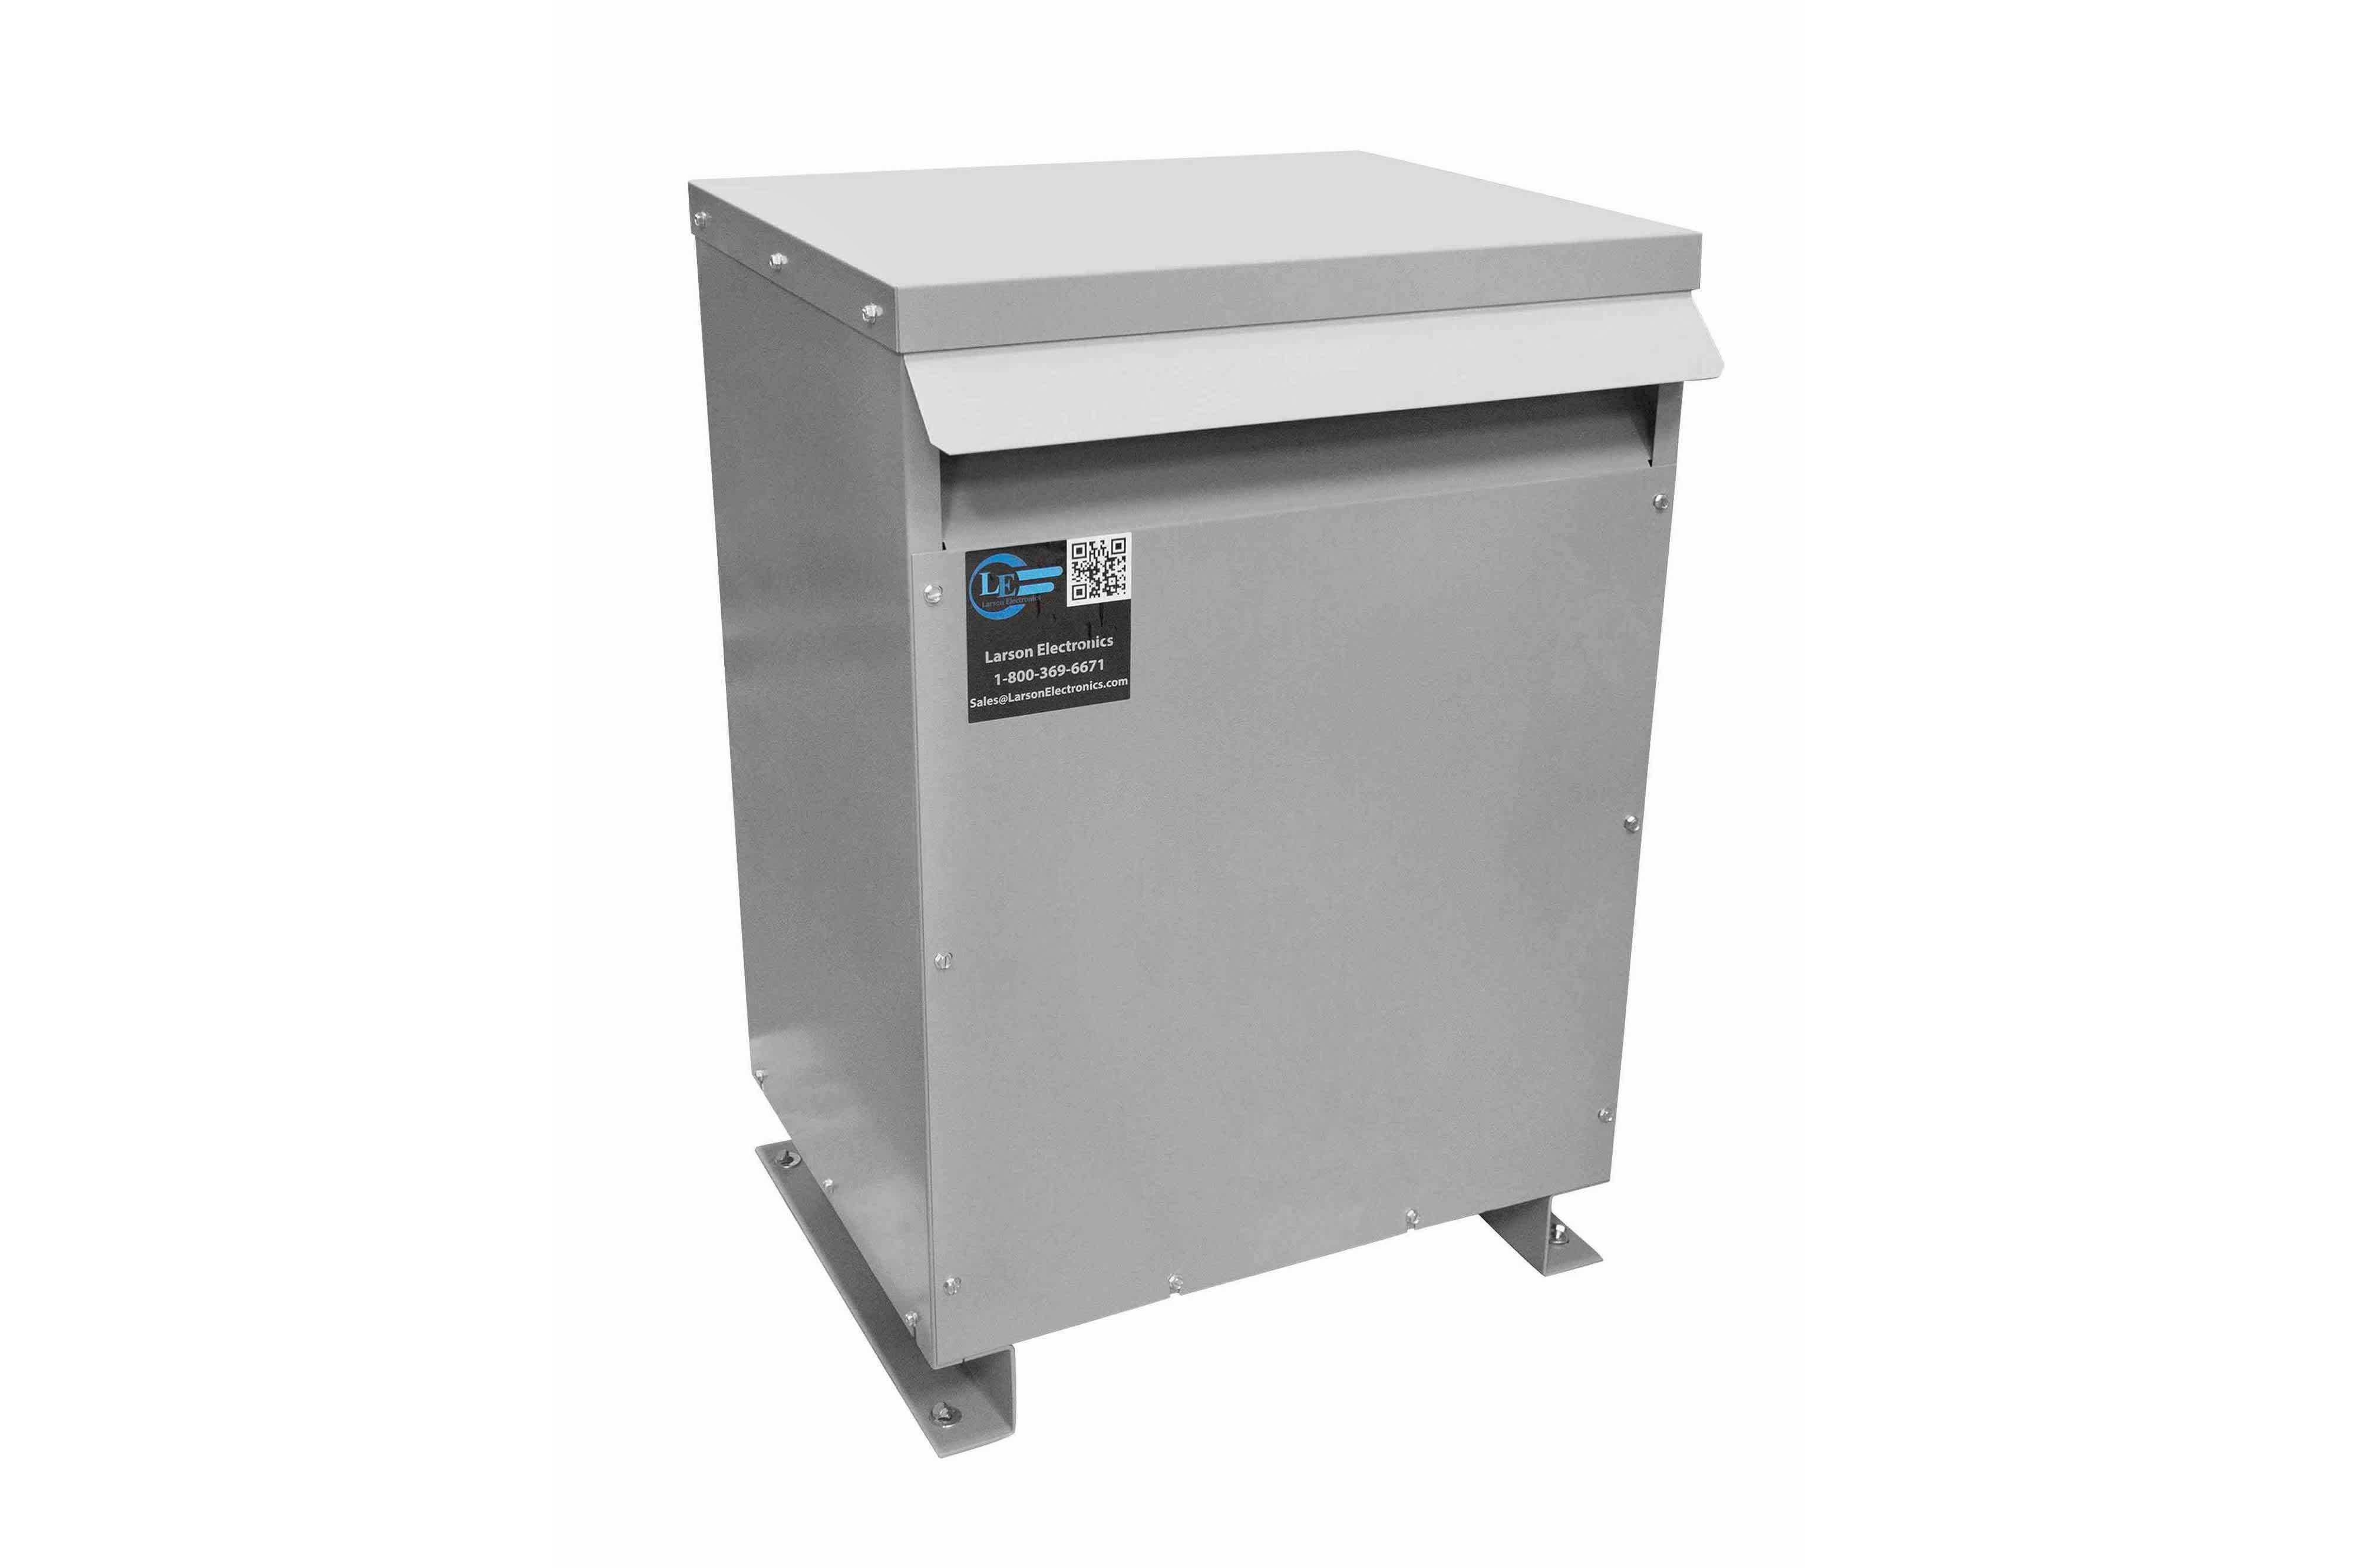 237.5 kVA 3PH Isolation Transformer, 230V Wye Primary, 208V Delta Secondary, N3R, Ventilated, 60 Hz